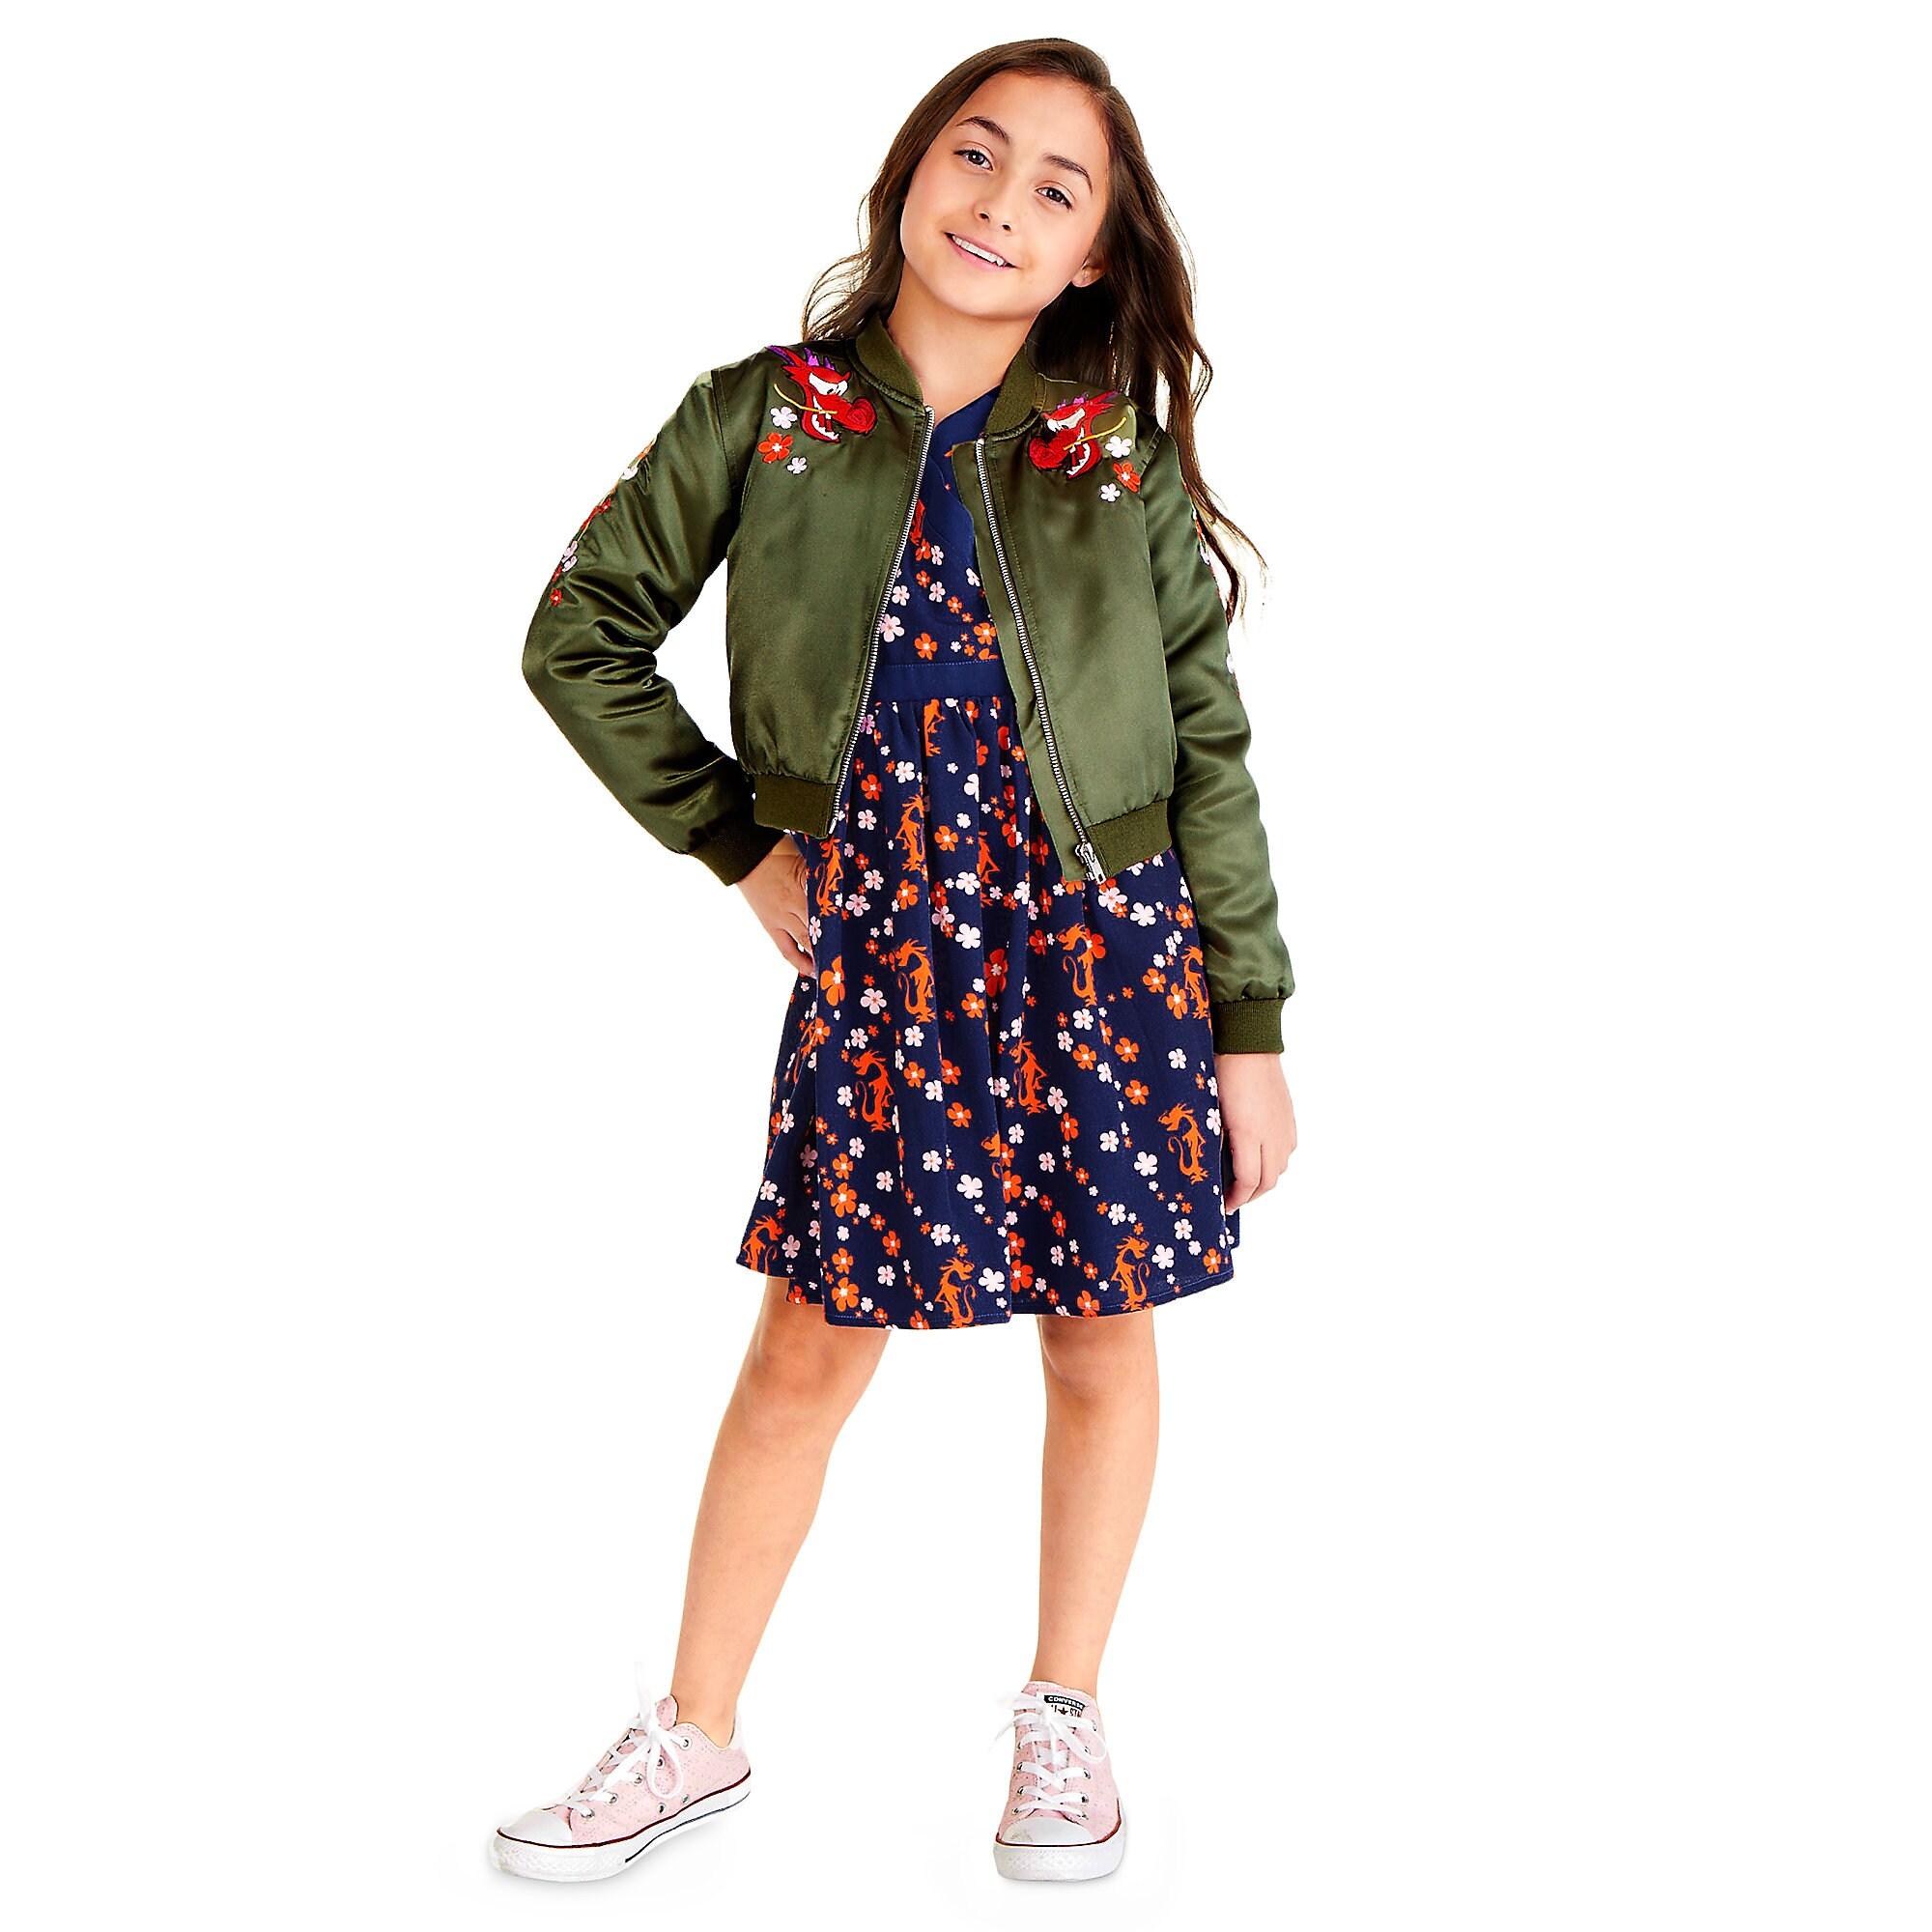 Mulan Fashion Collection for Girls